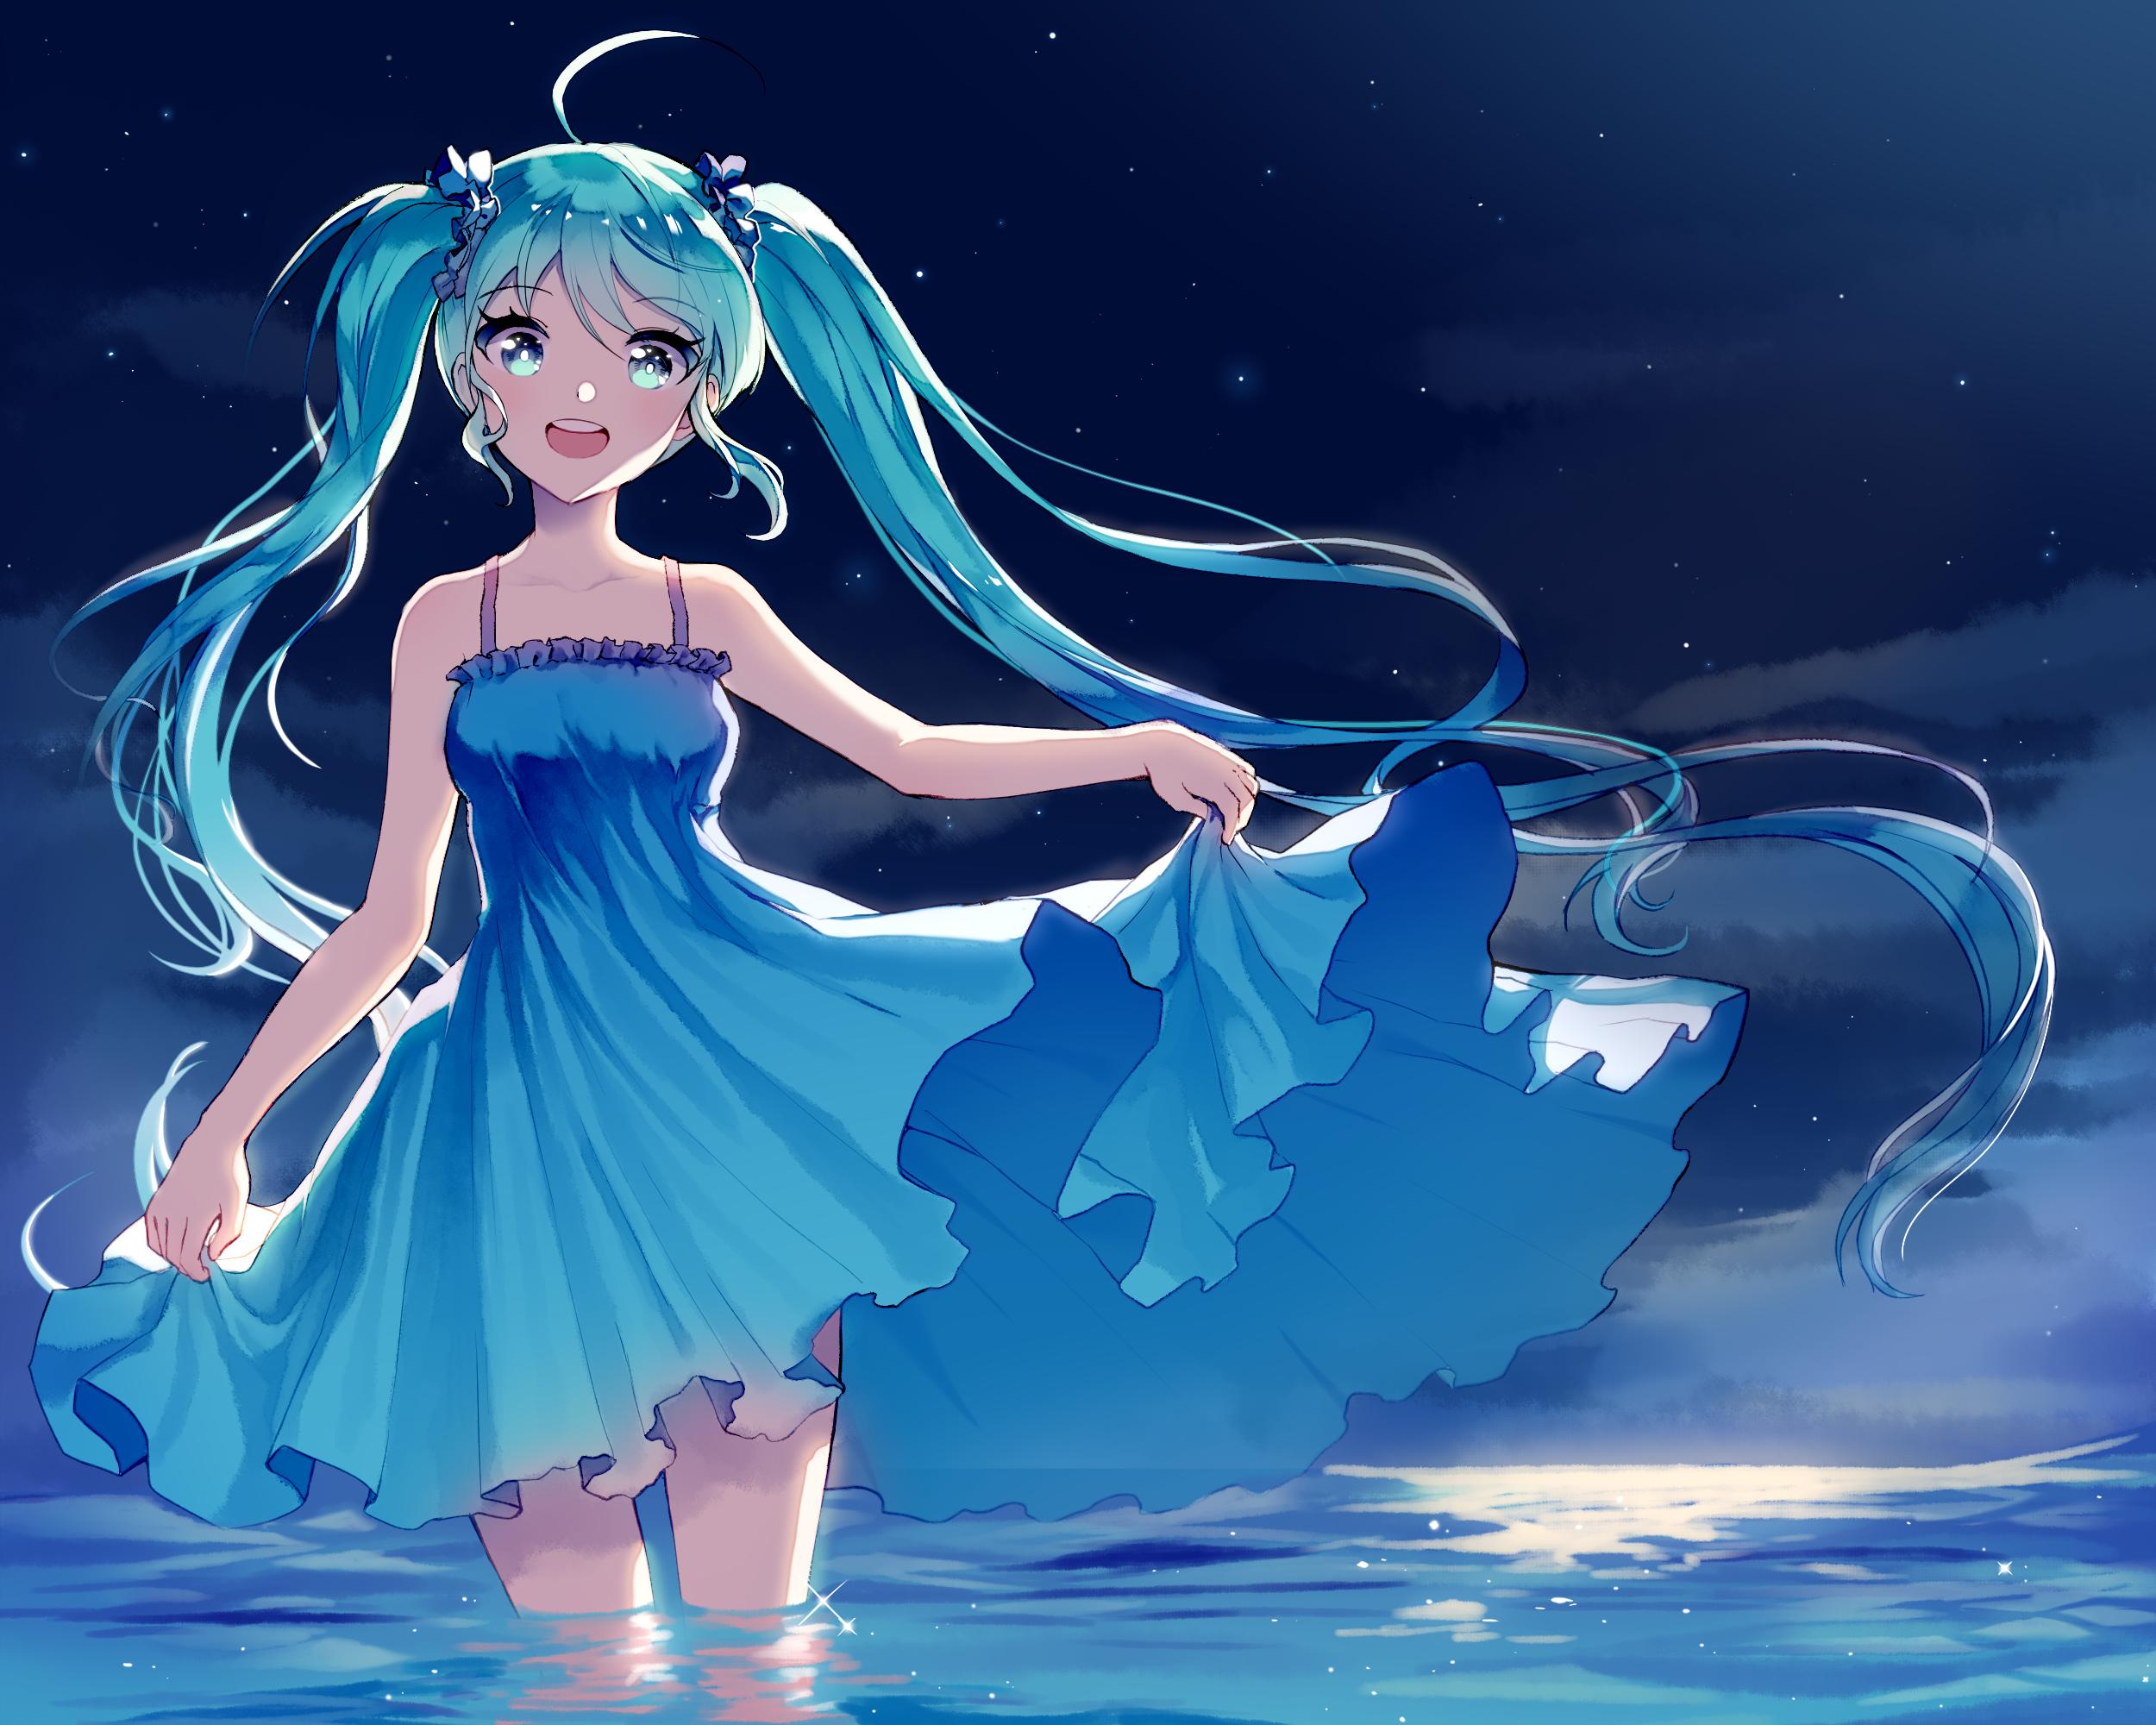 Wasser im anime nackt girl Girls Nackt